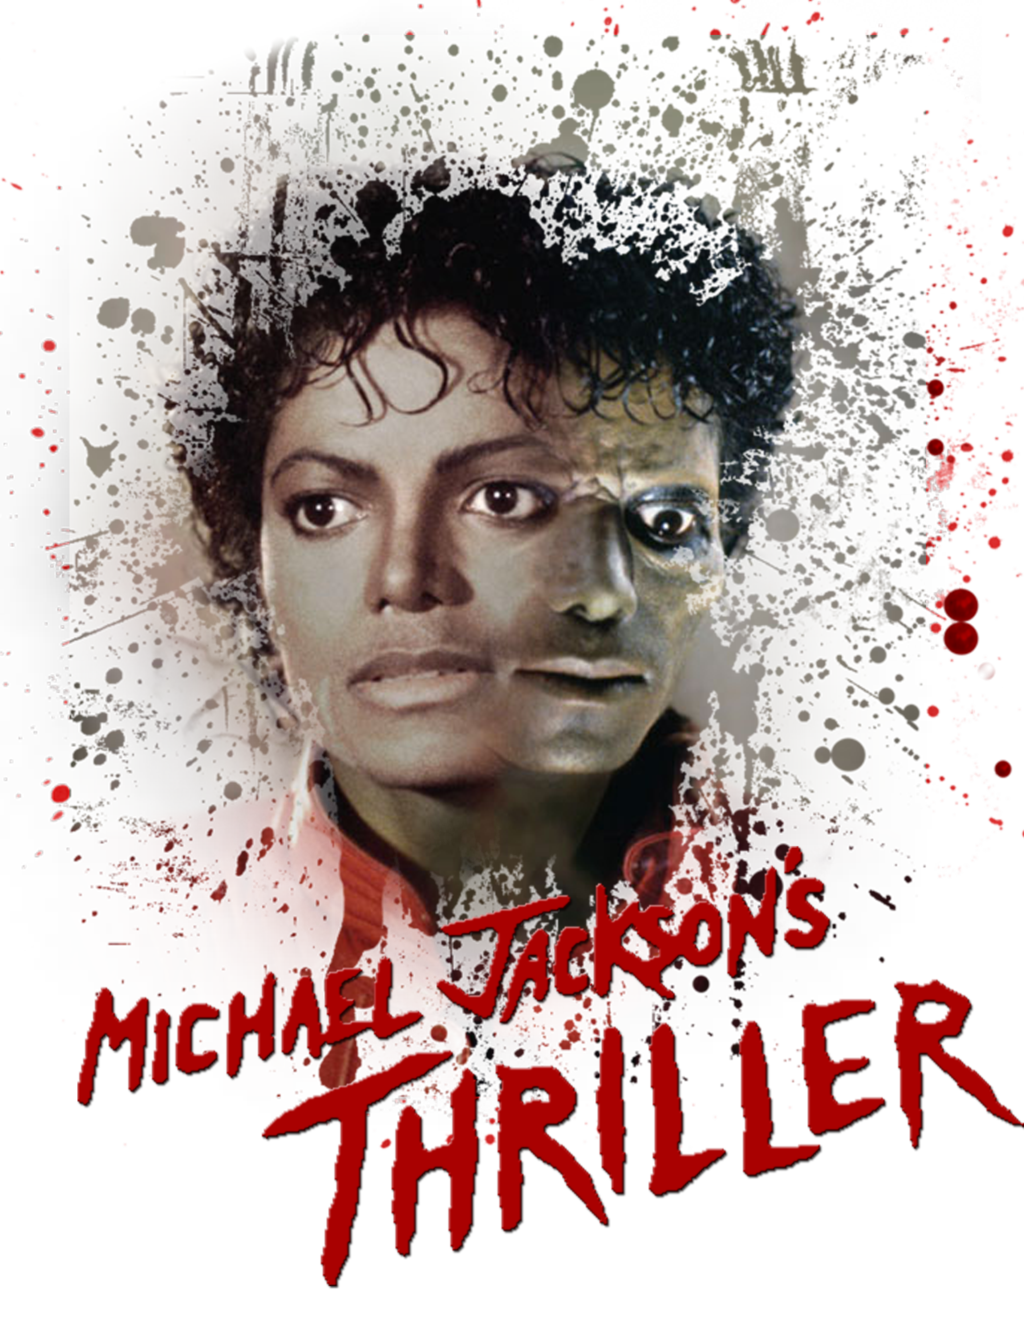 Michael Jackson S Thriller By Telibabbyjackson On Deviantart Michael Jackson Thriller Michael Jackson Zombie Michael Jackson Art